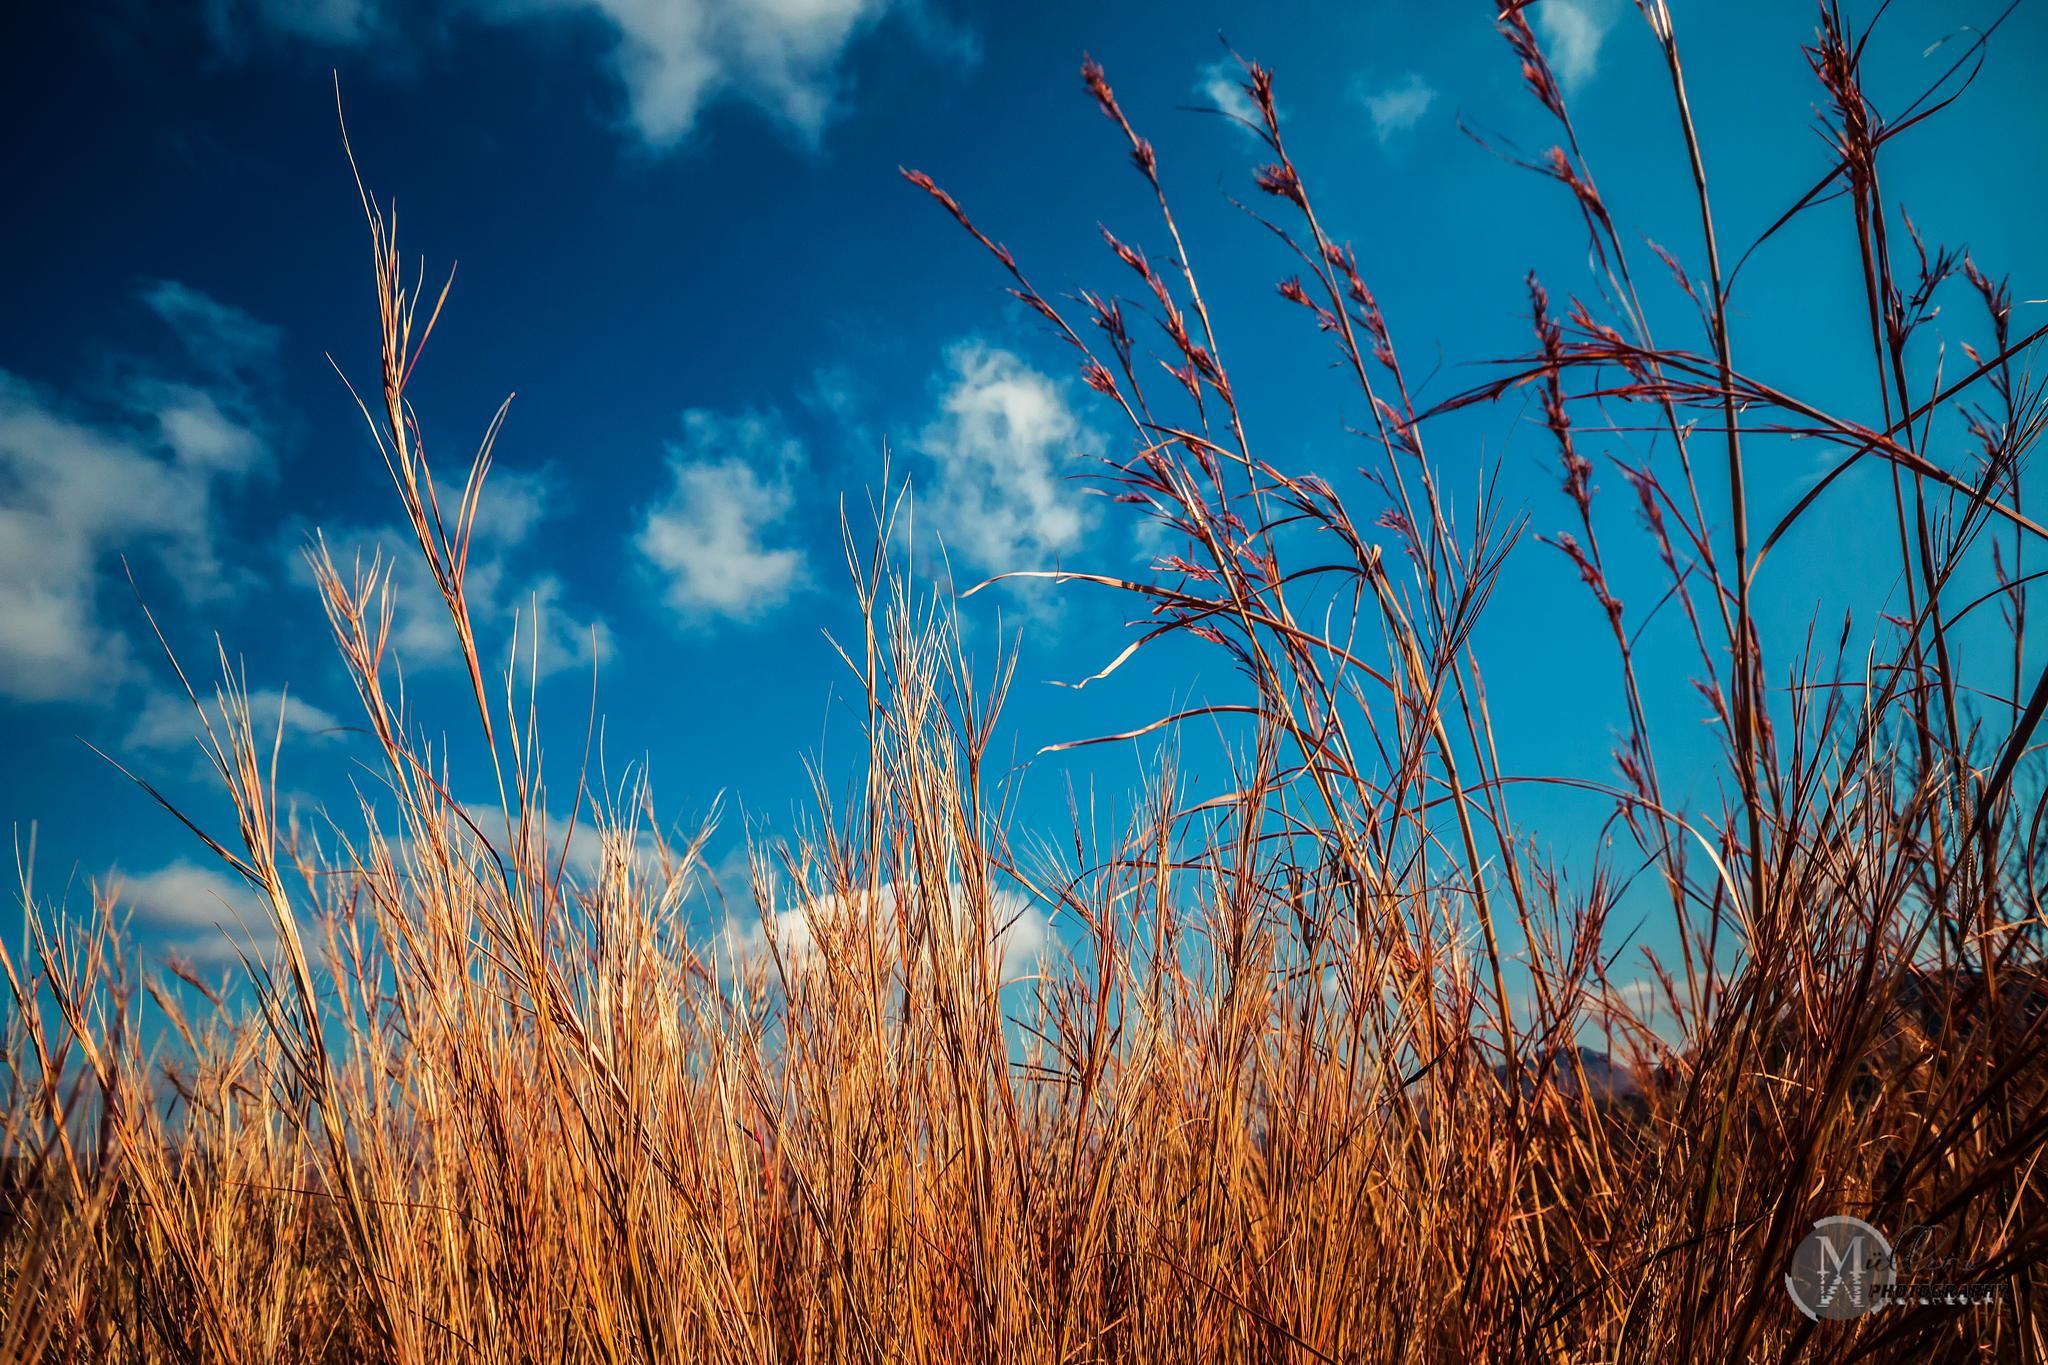 winter grass by Carl Muller